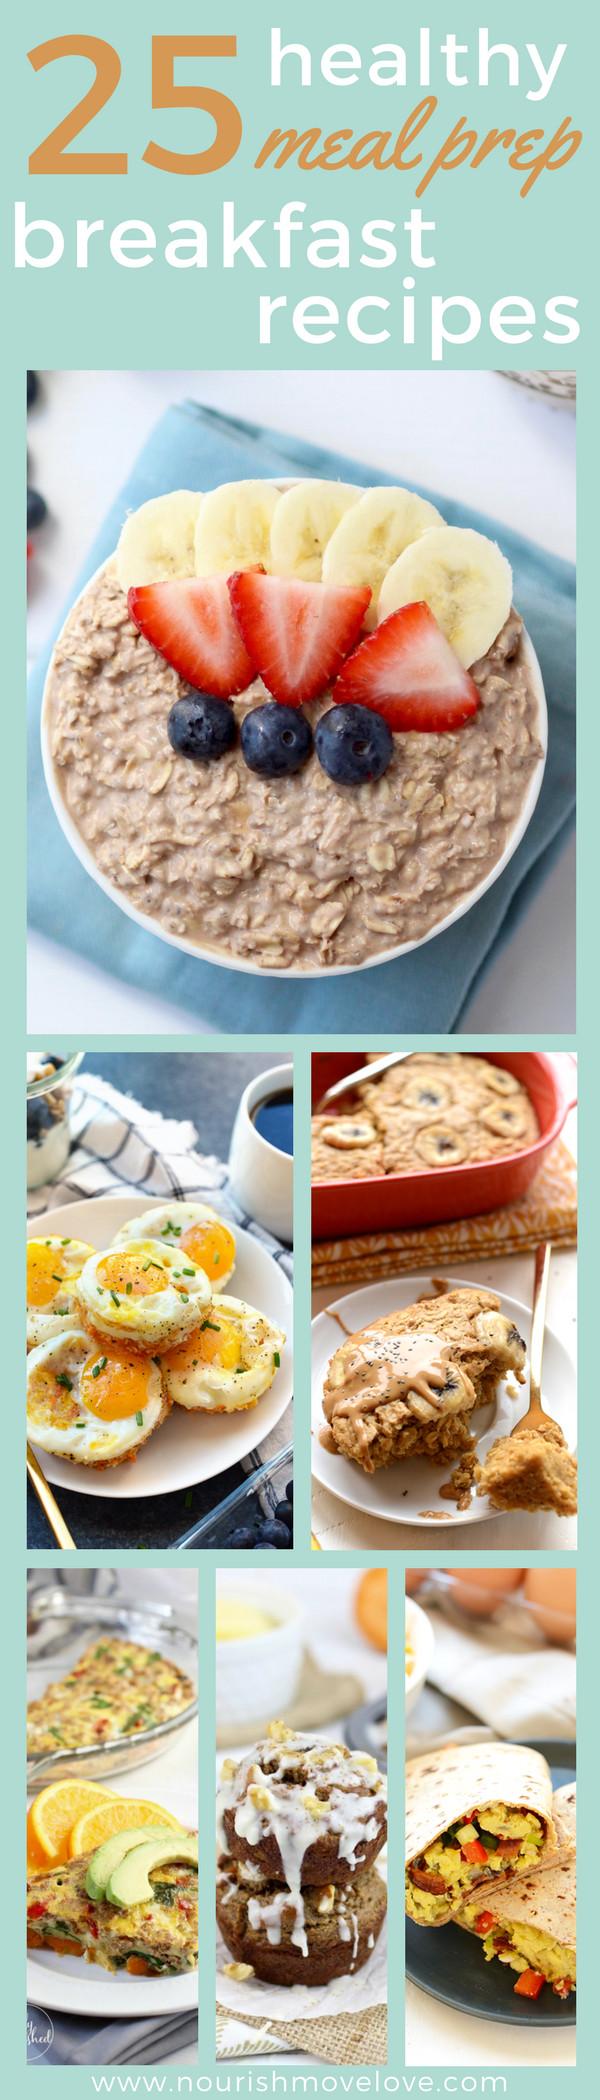 Healthy Breakfast Prep  25 Healthy Meal Prep Breakfast Recipes